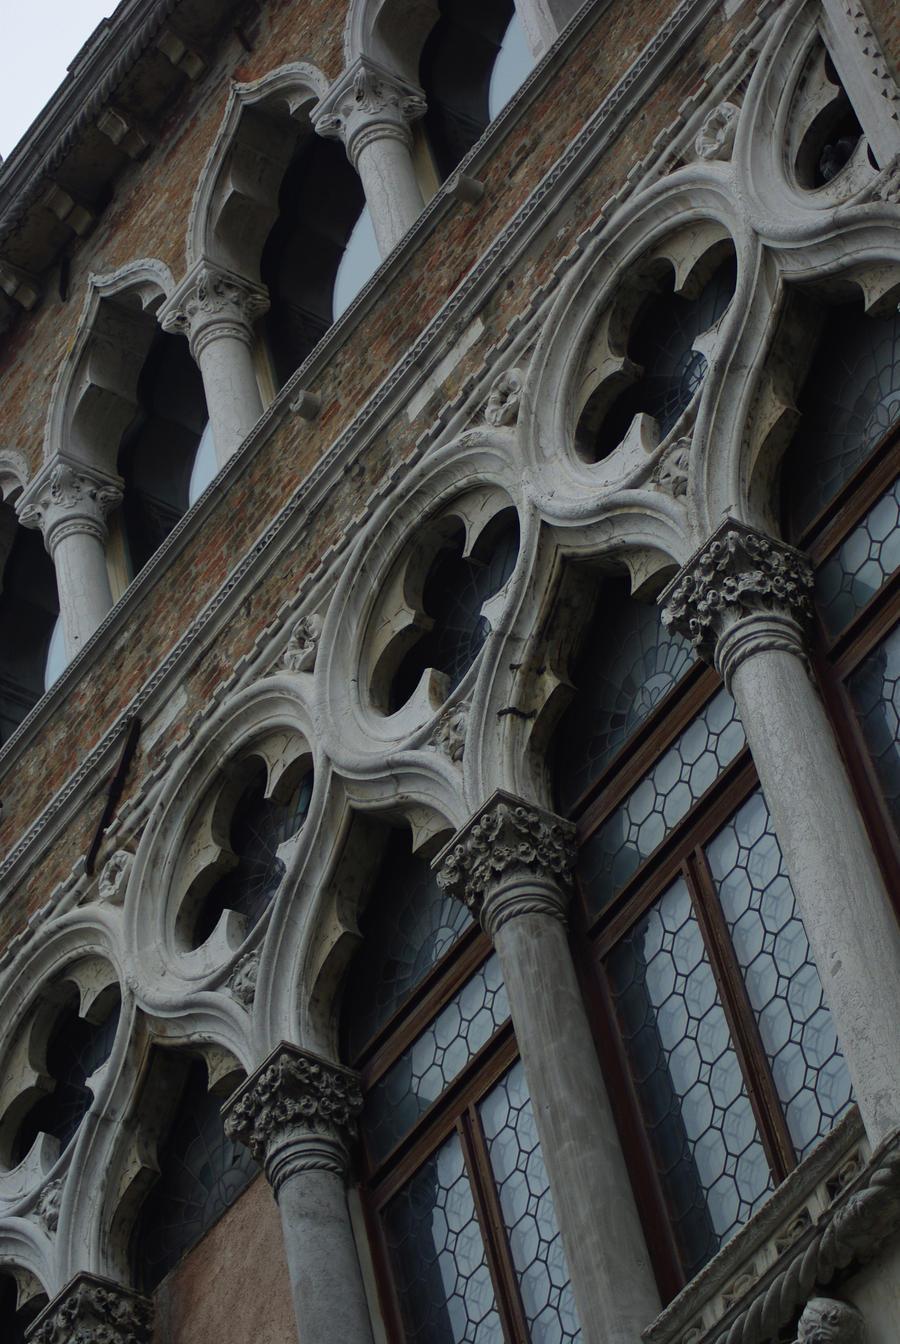 Venetian architecture 3 by jennystokes